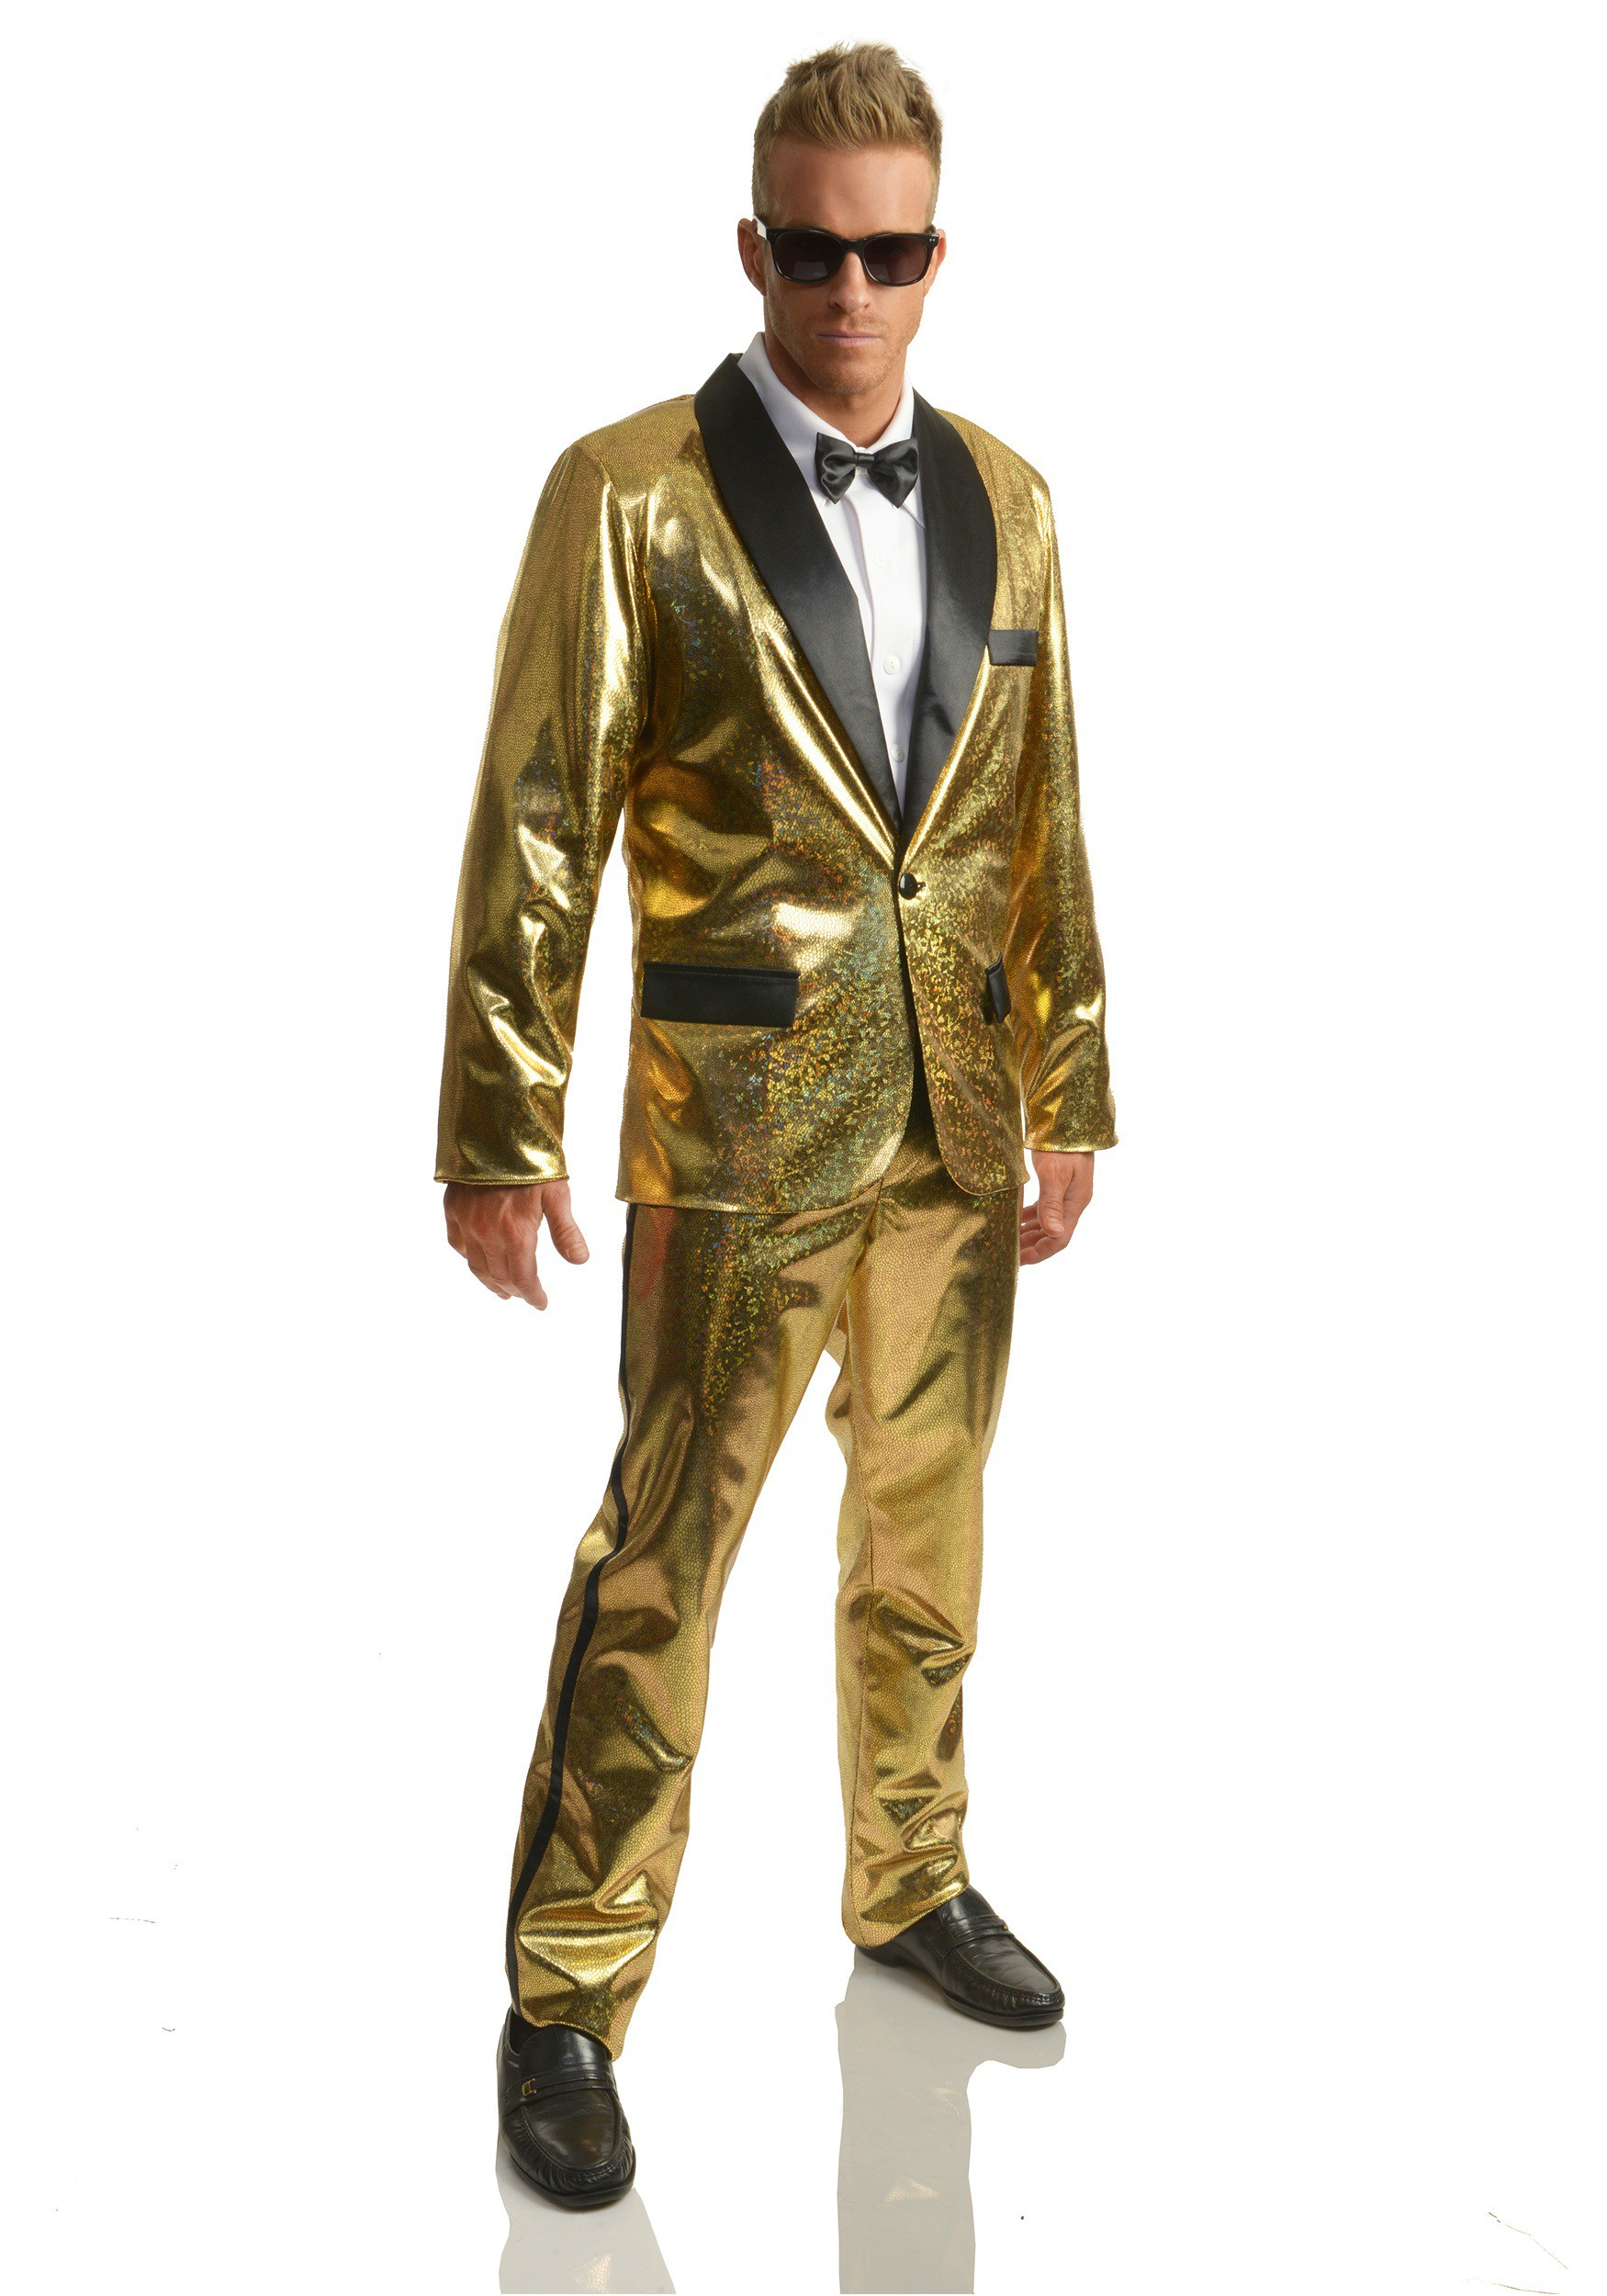 Gold Disco Ball Tuxedo Costume For Adult